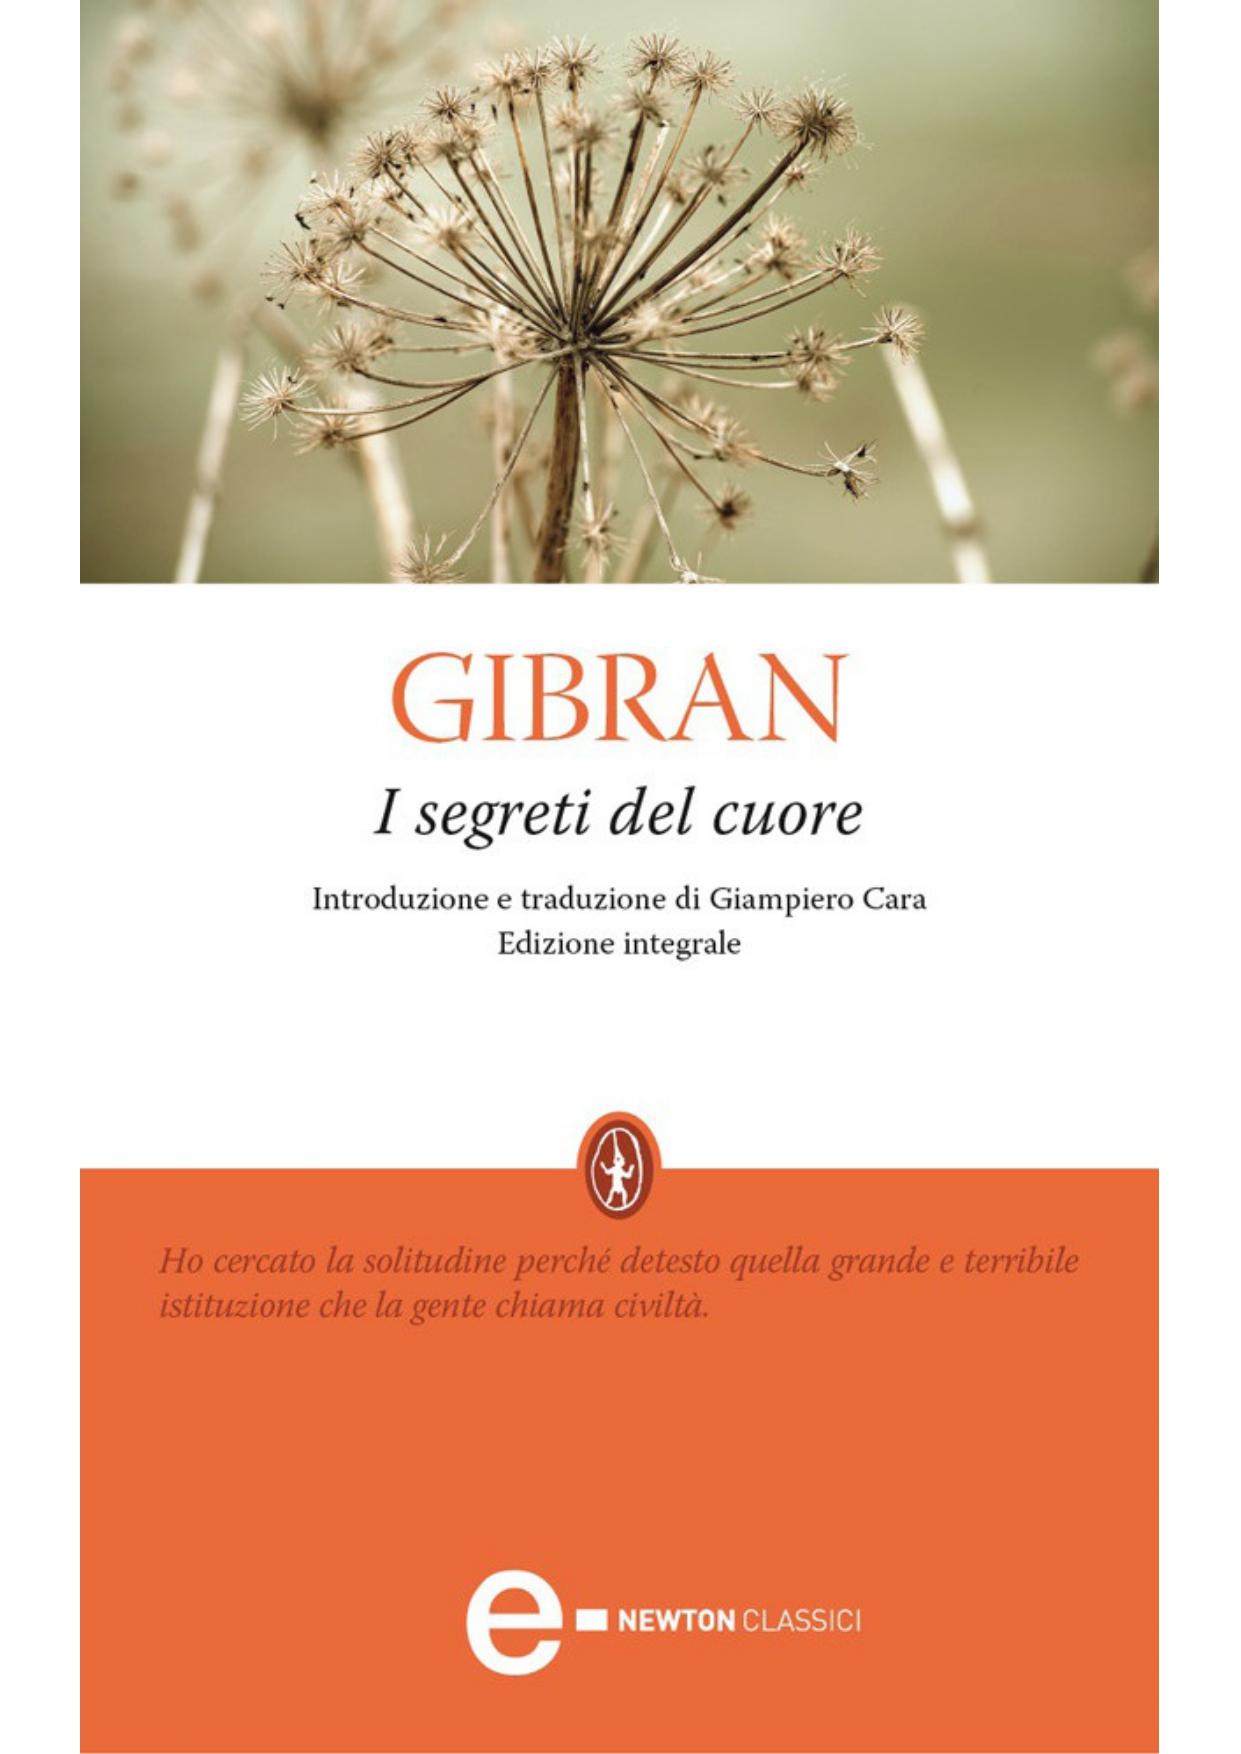 Kahlil Gibran, I segreti del cuore (Secrets of the Heart), translated into Italian by Giampiero Cara, Rome: Newton Compton, 2012.